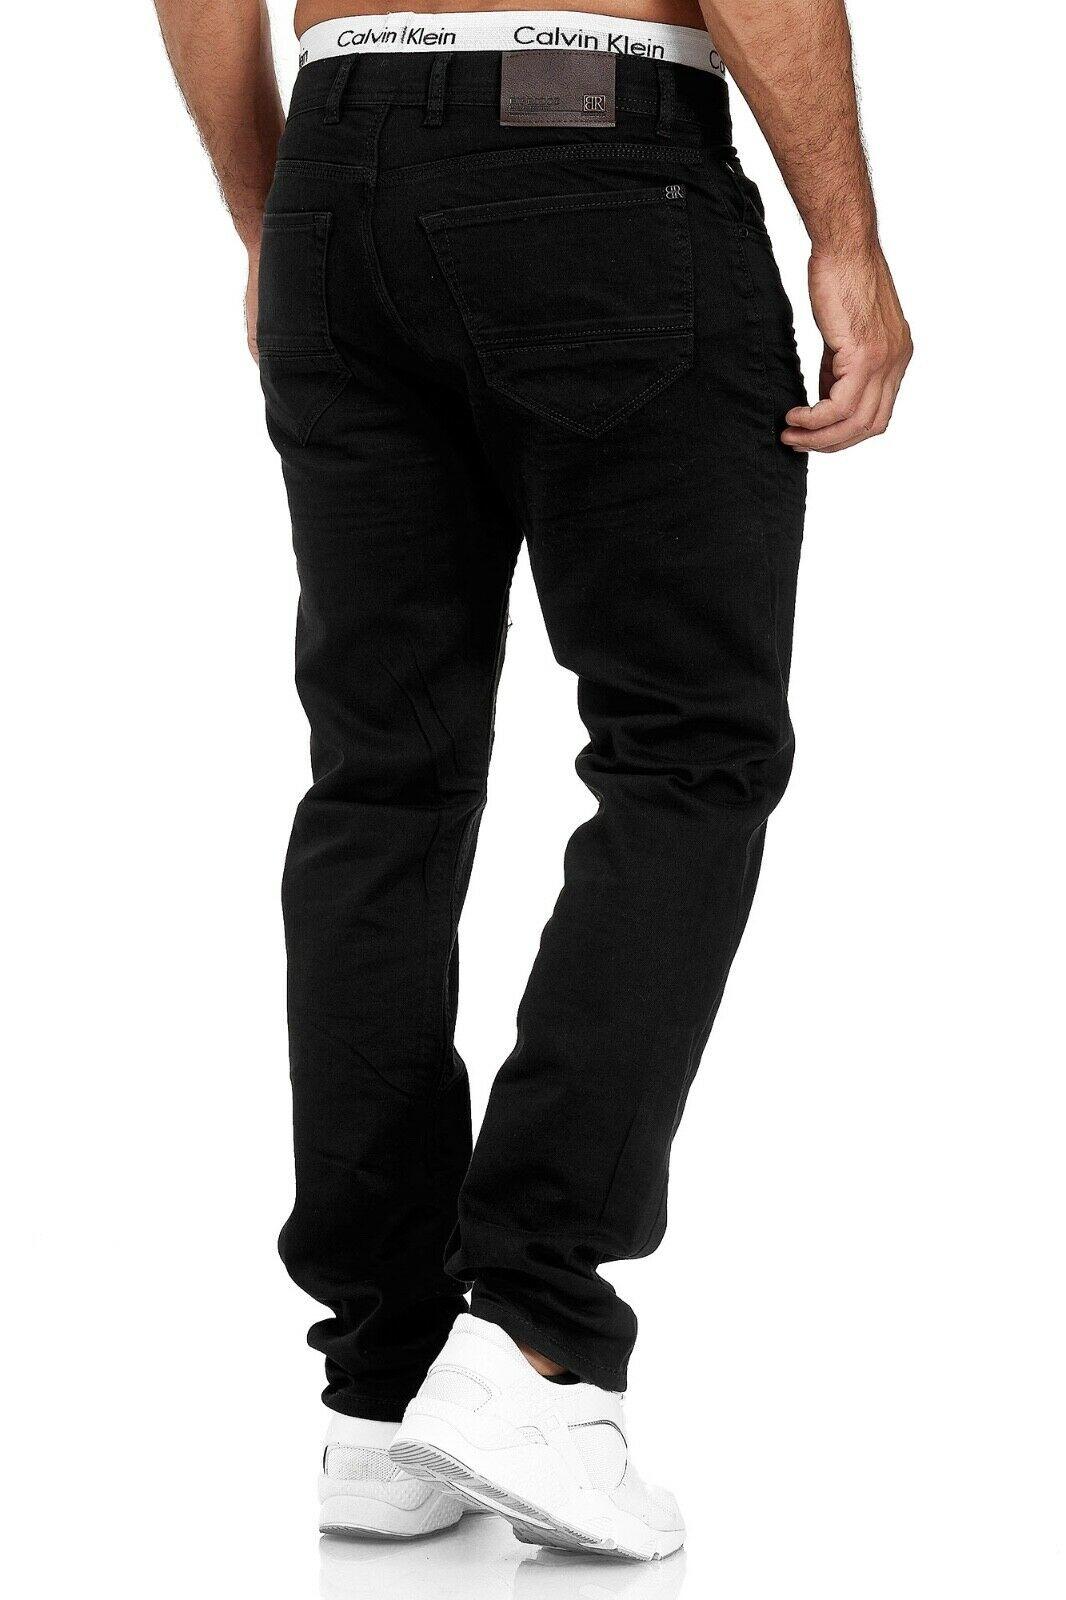 Herren-Jeans-Hose-Denim-KC-Black-Washed-Straight-Cut-Regular-Dicke-Naht-naehte Indexbild 79